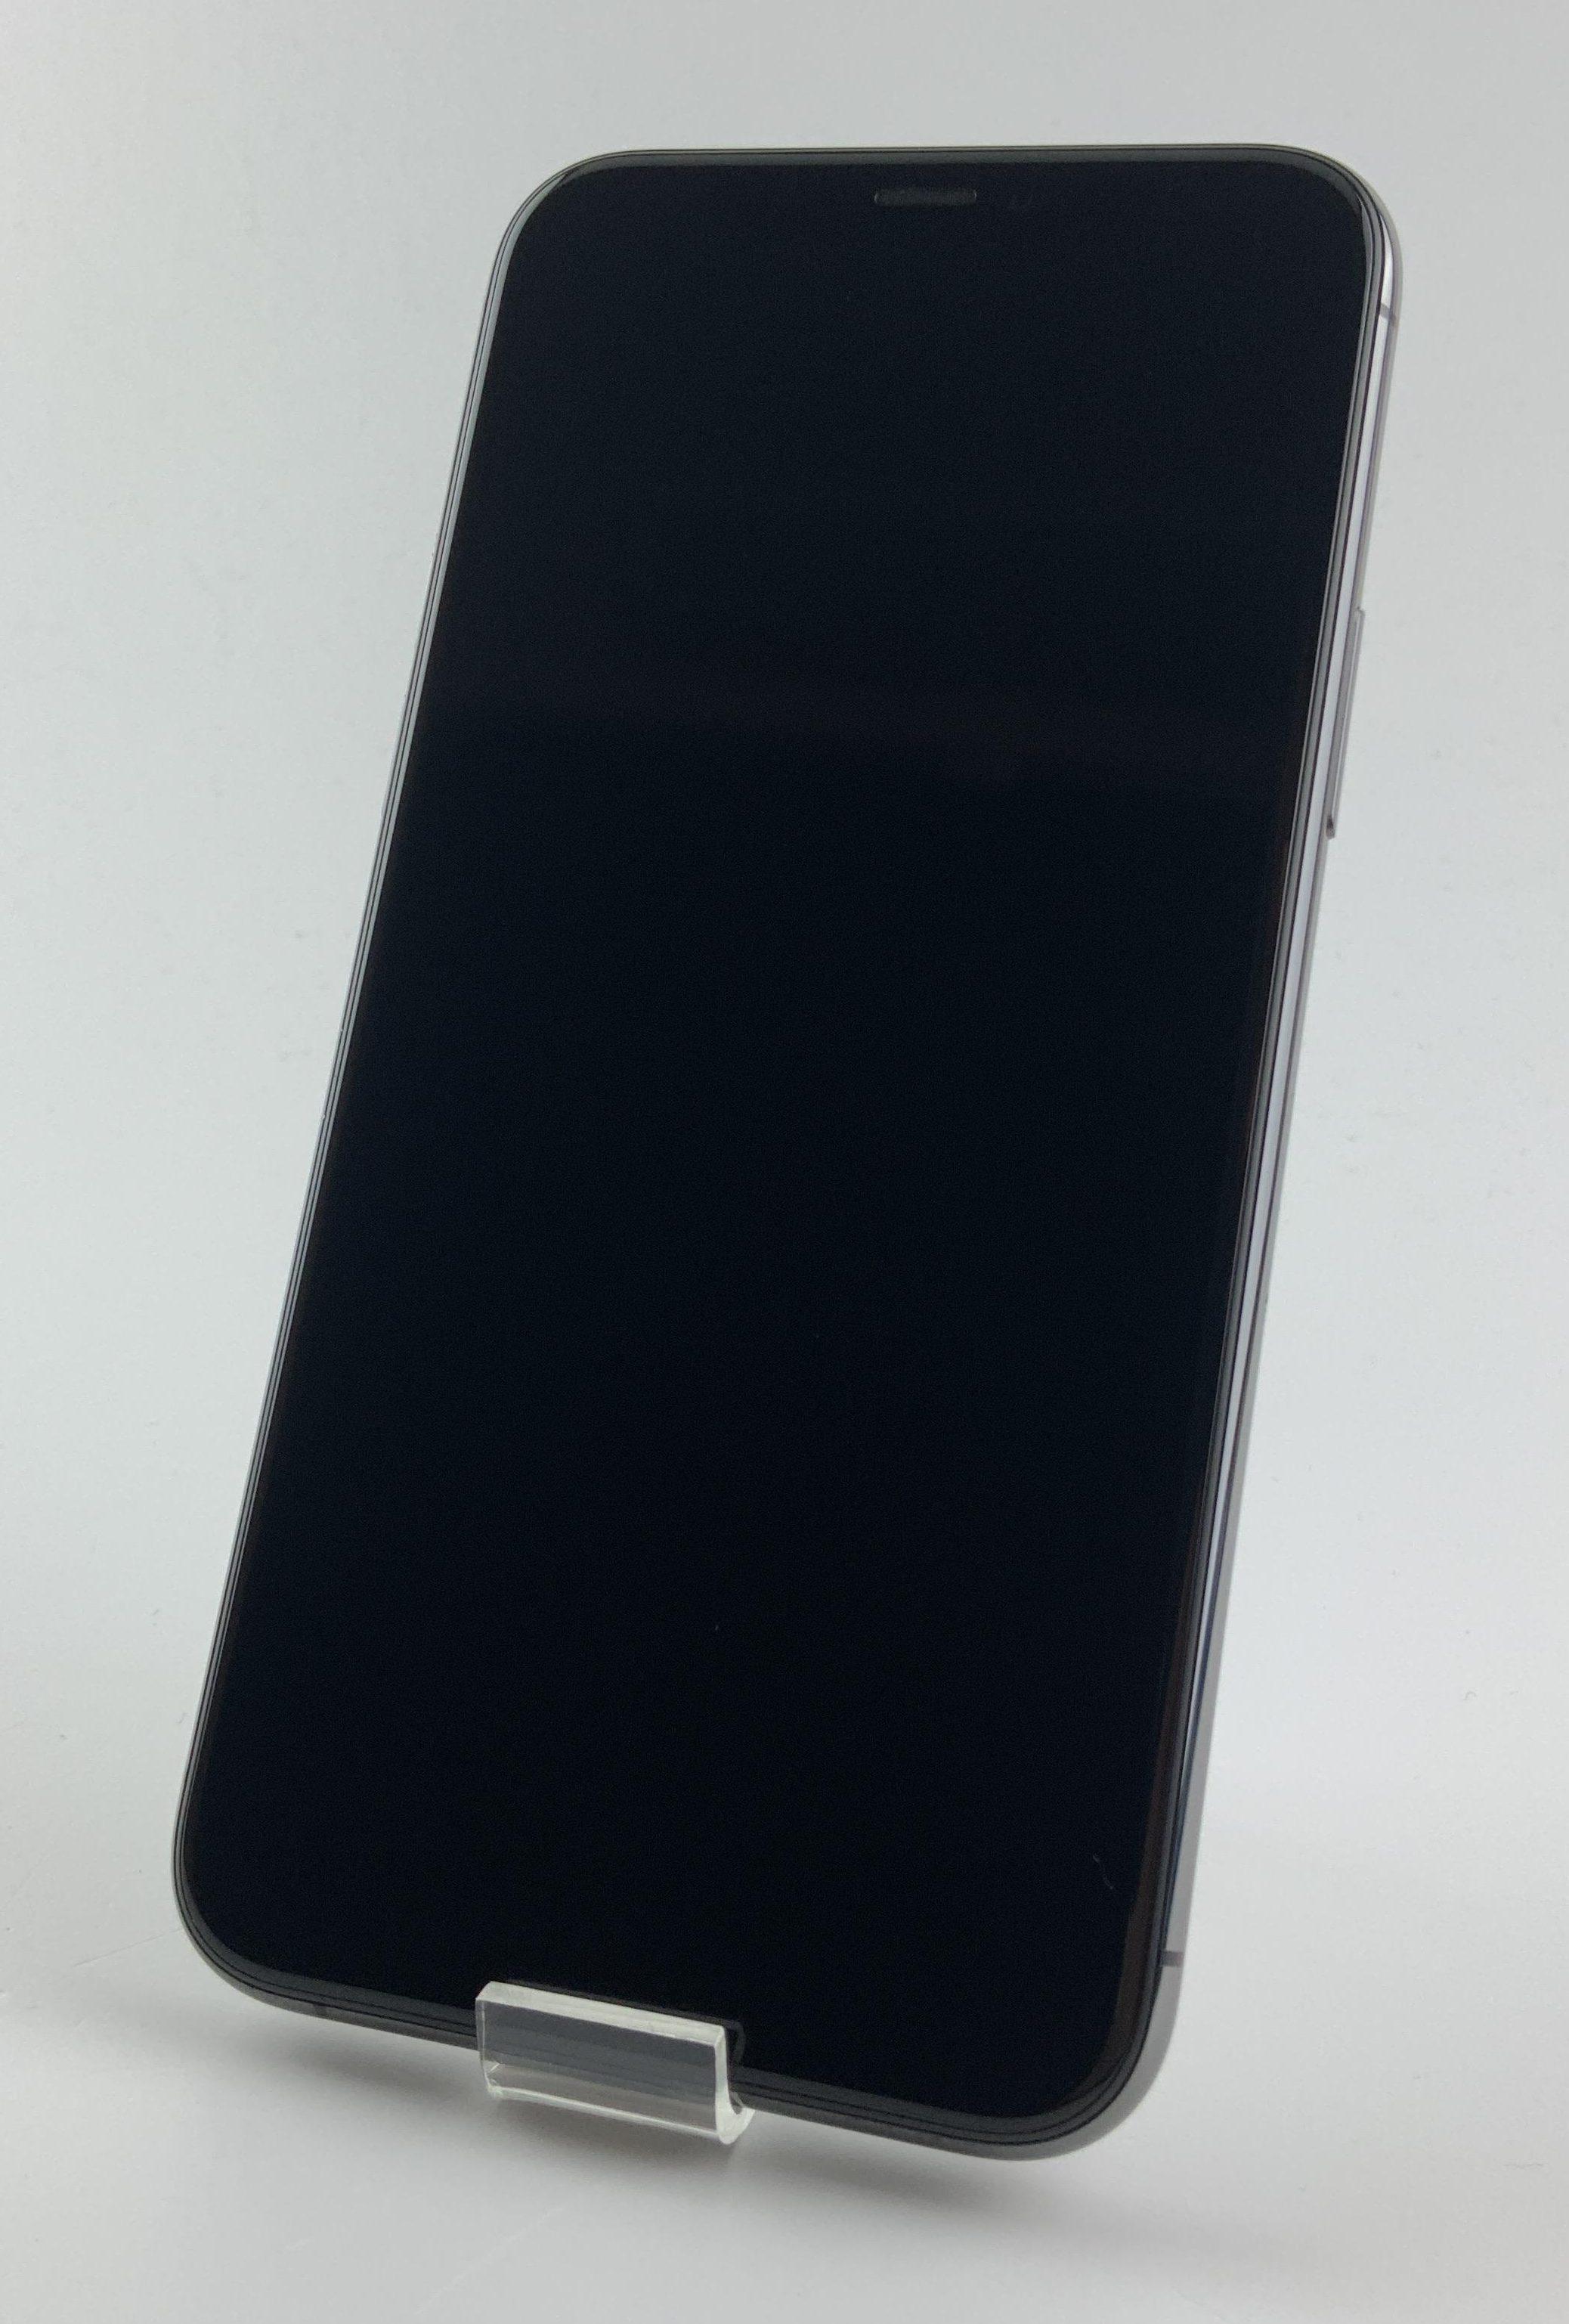 iPhone 11 Pro 256GB, 256GB, Space Gray, image 1